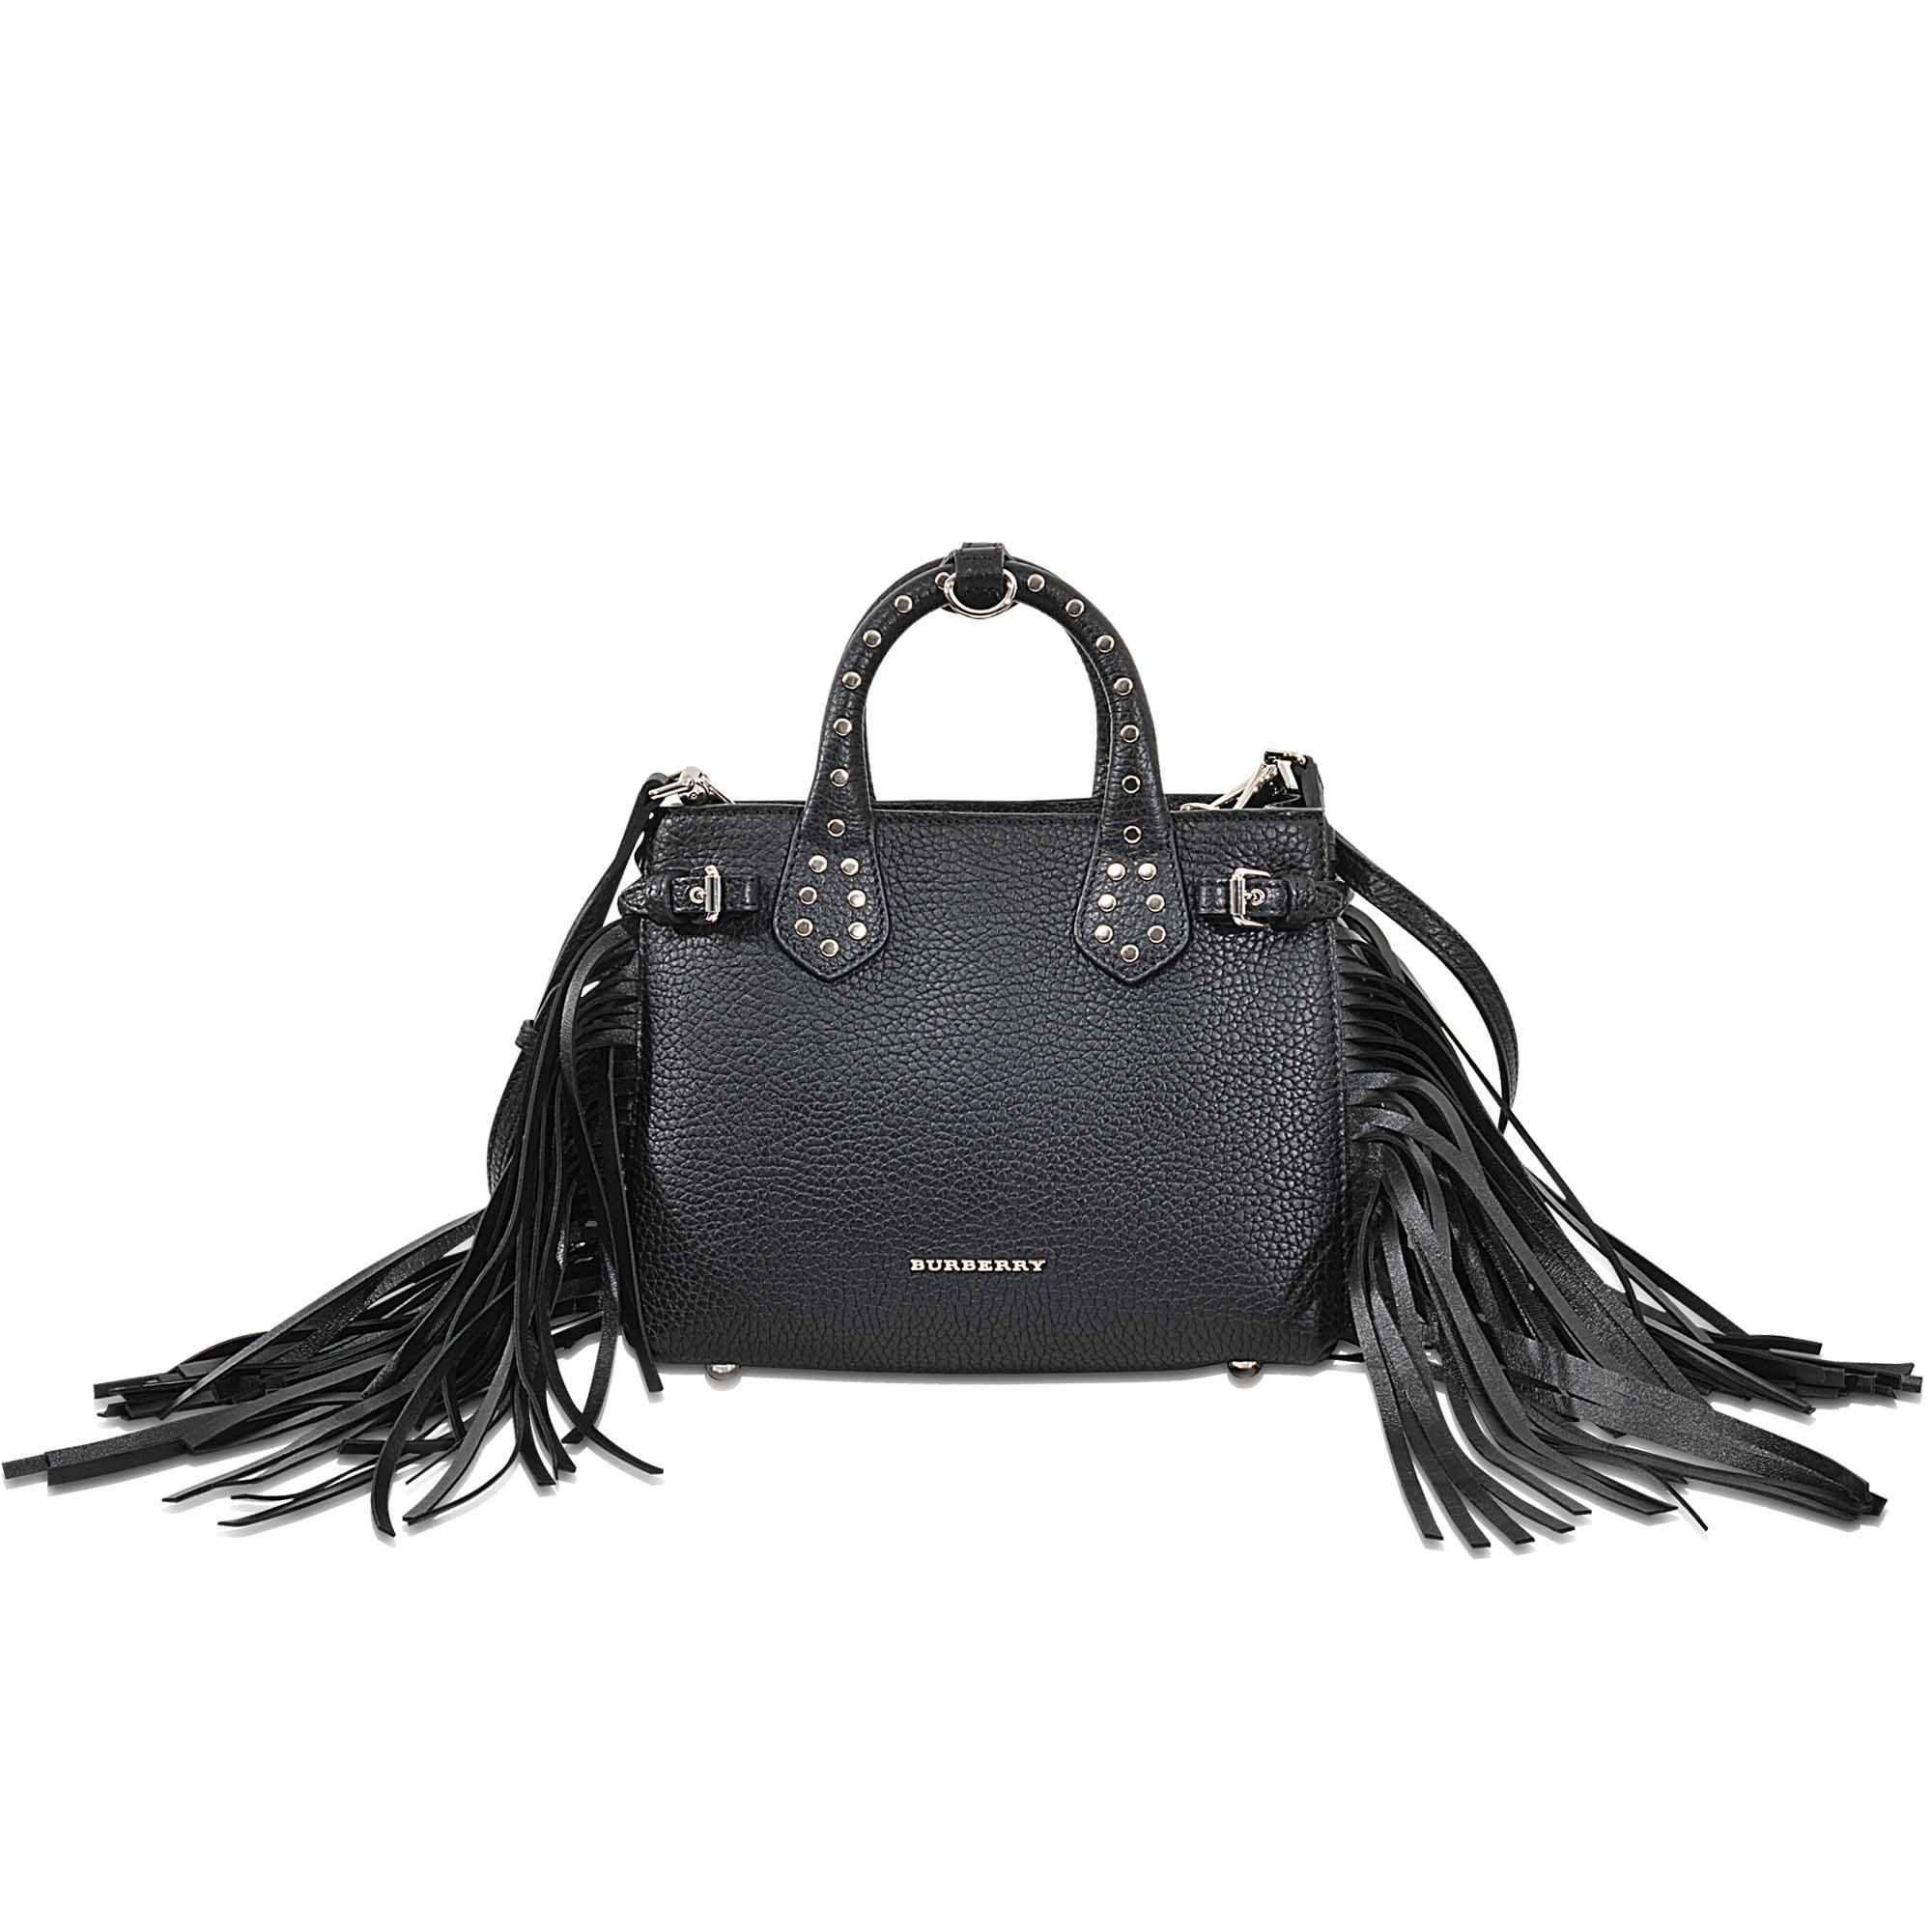 Lyst - Burberry Baby Banner Bag in Black a3bae84dbc1df